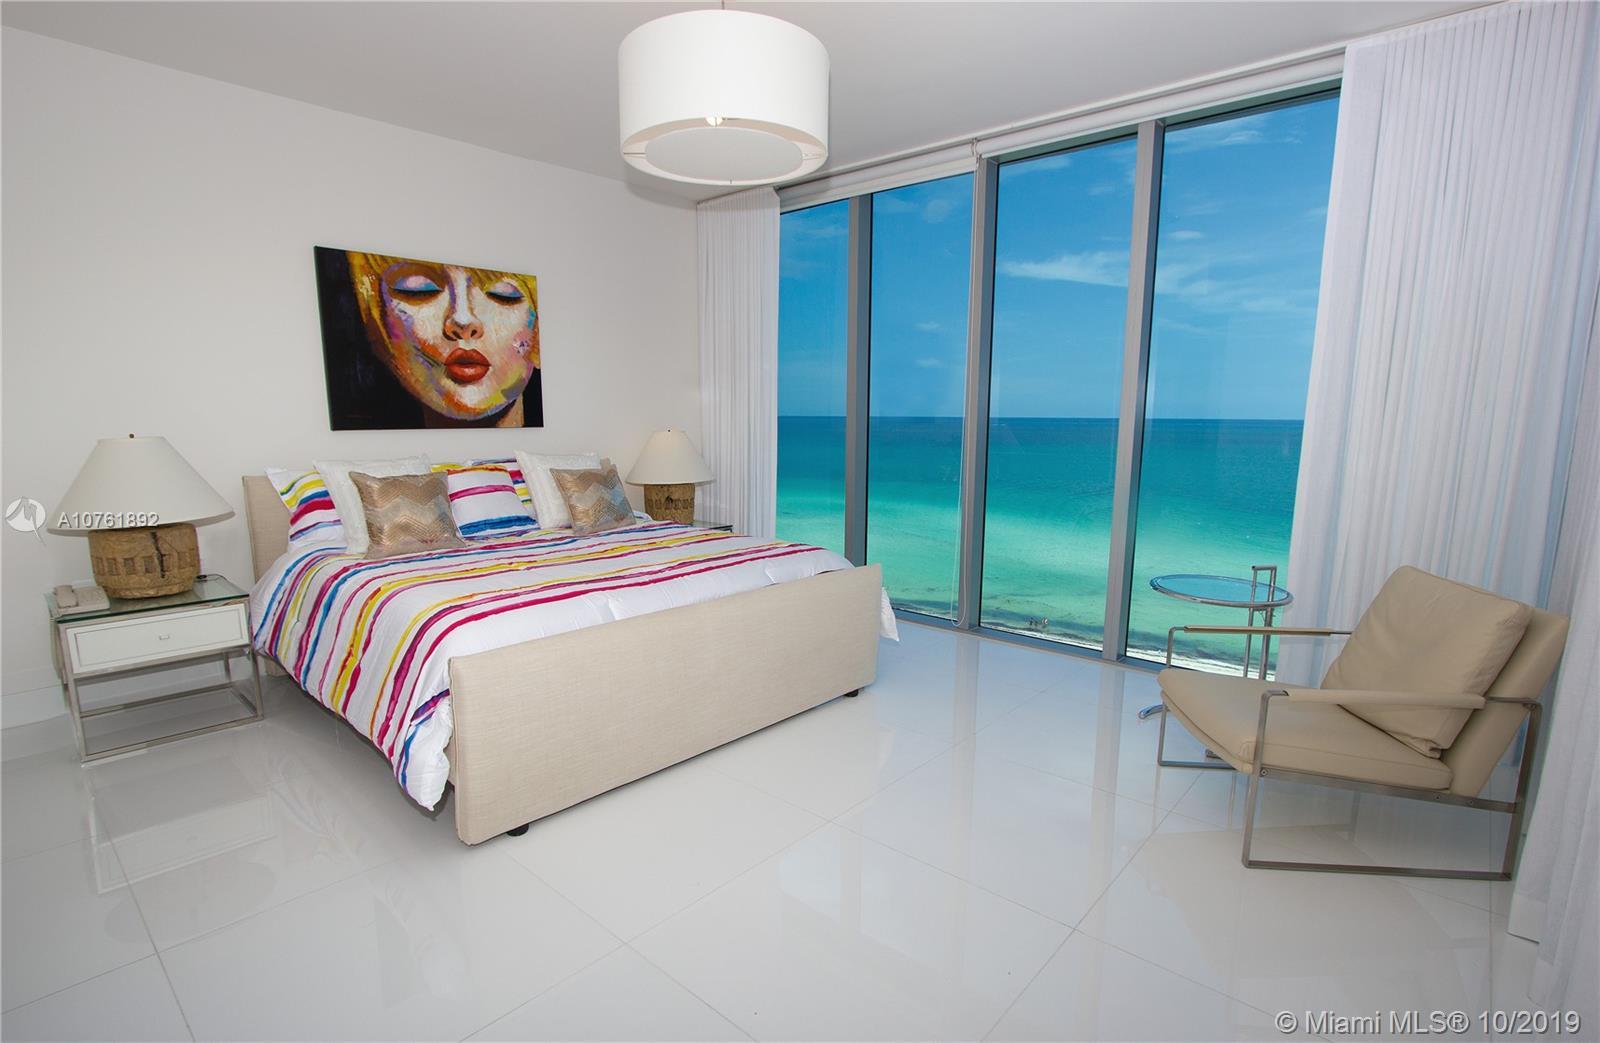 6899 Collins Ave, 908 - Miami Beach, Florida